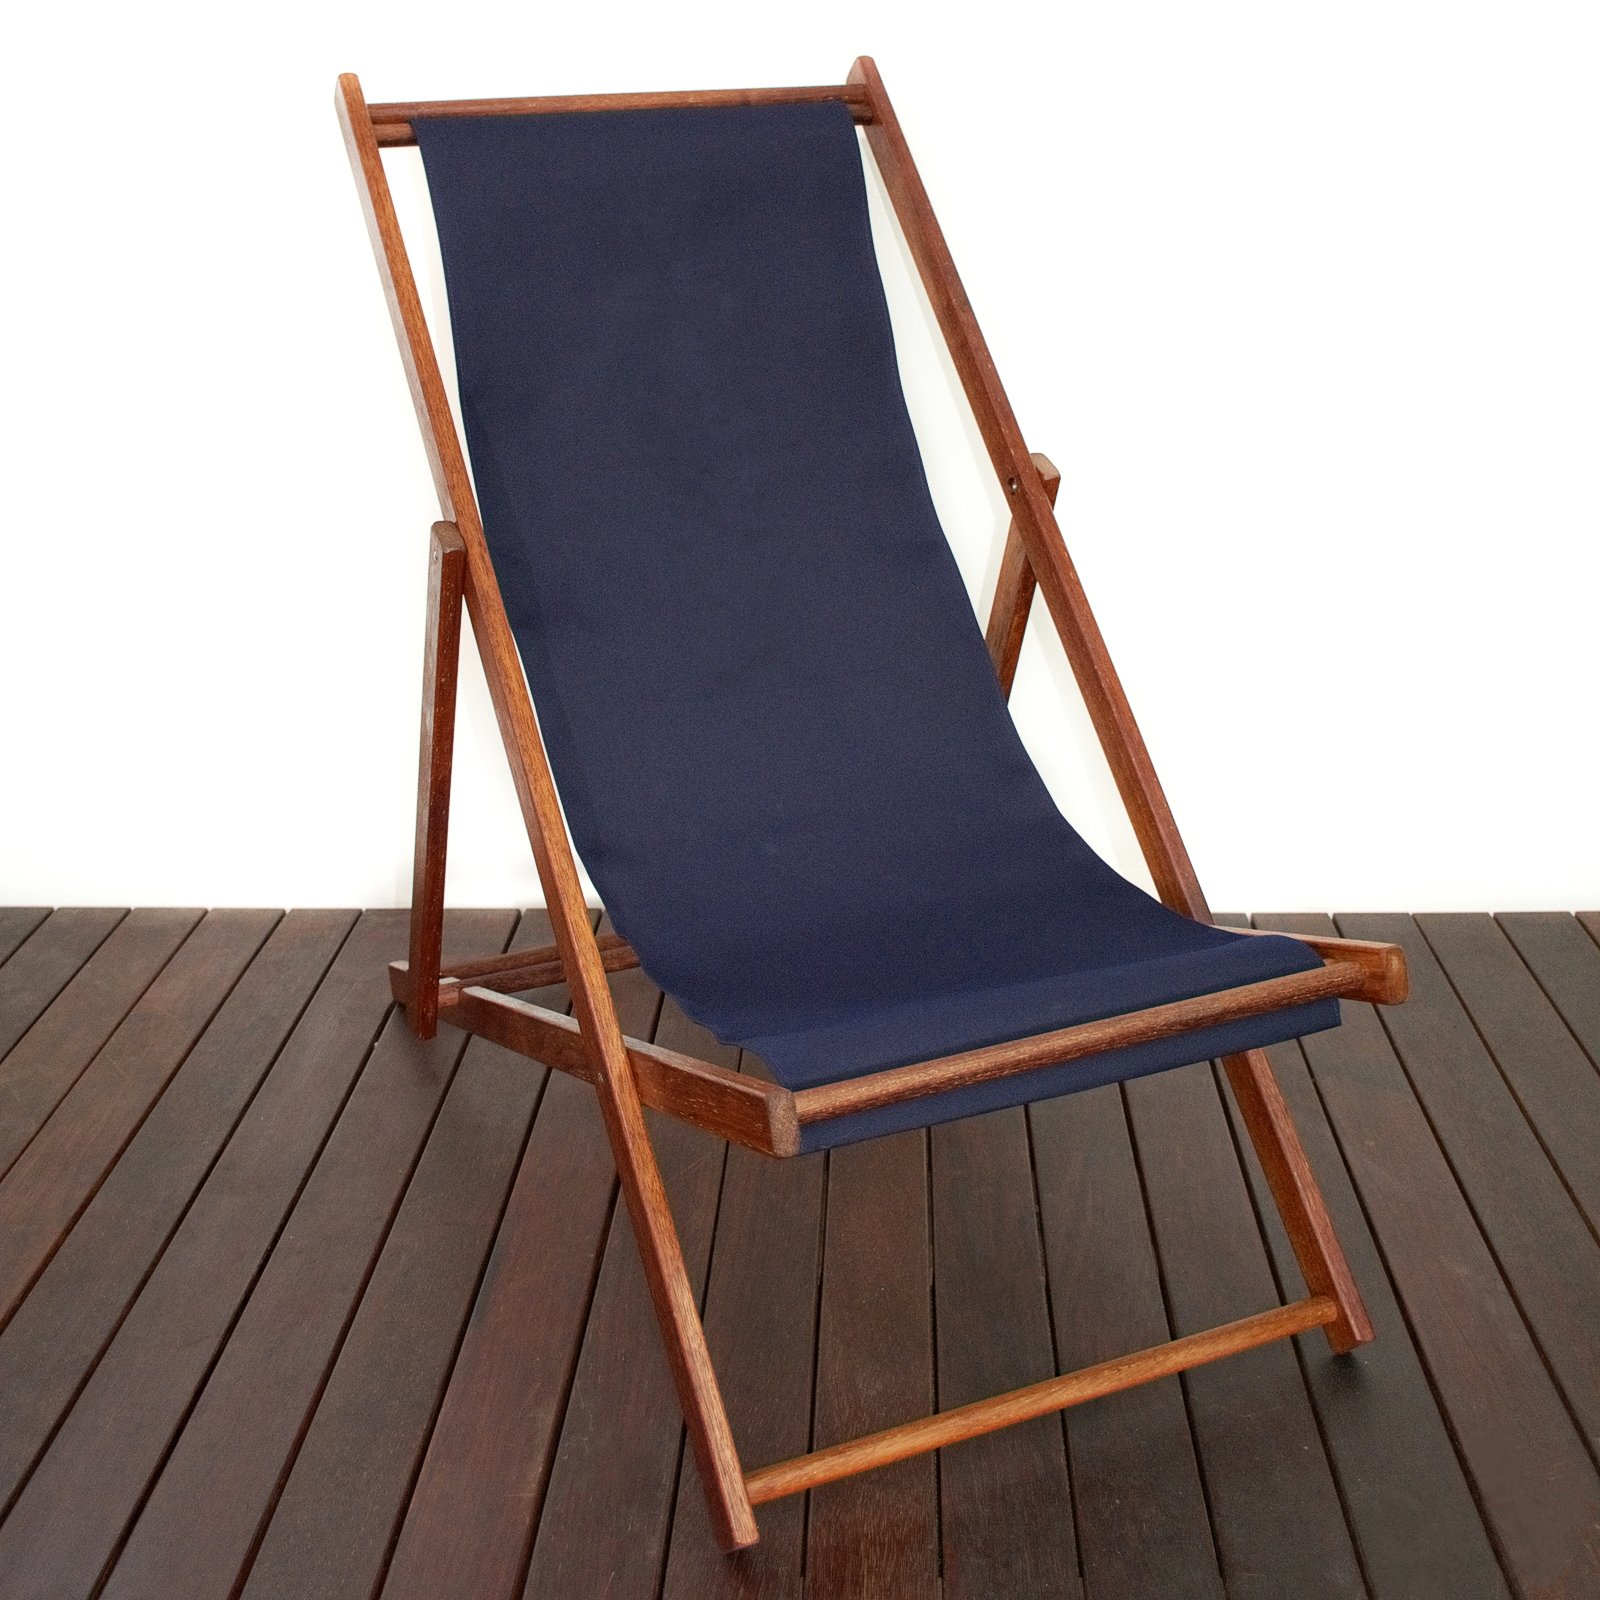 marine deck chairs little castle mesa chair and a half glider black sand furniture